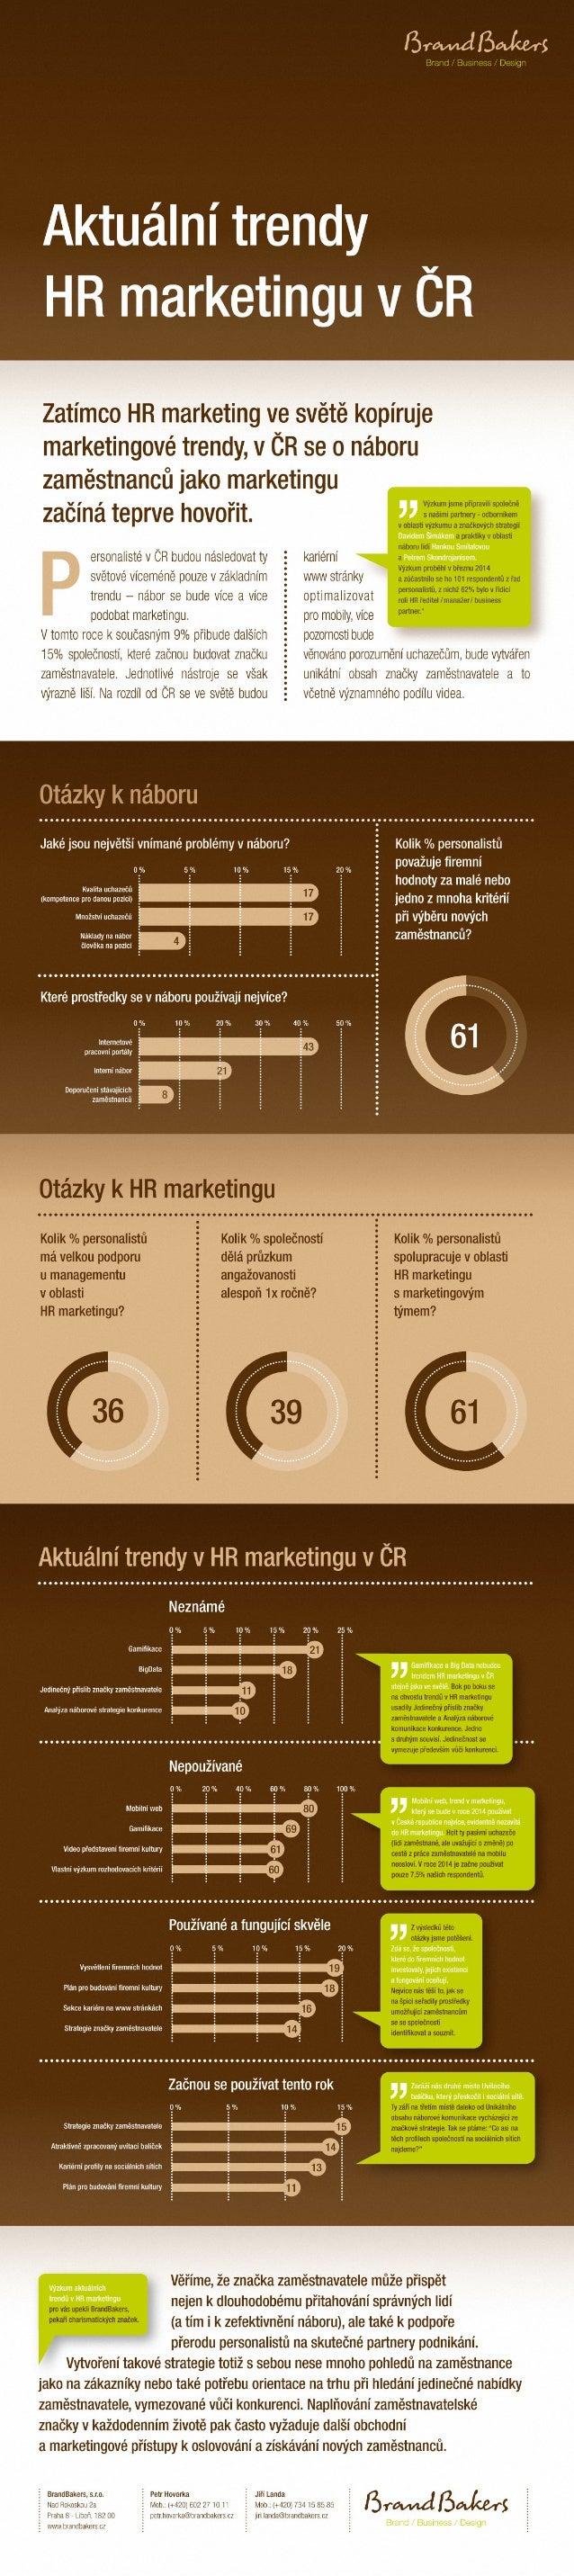 BrandBakers aktuální trendy HR marketingu